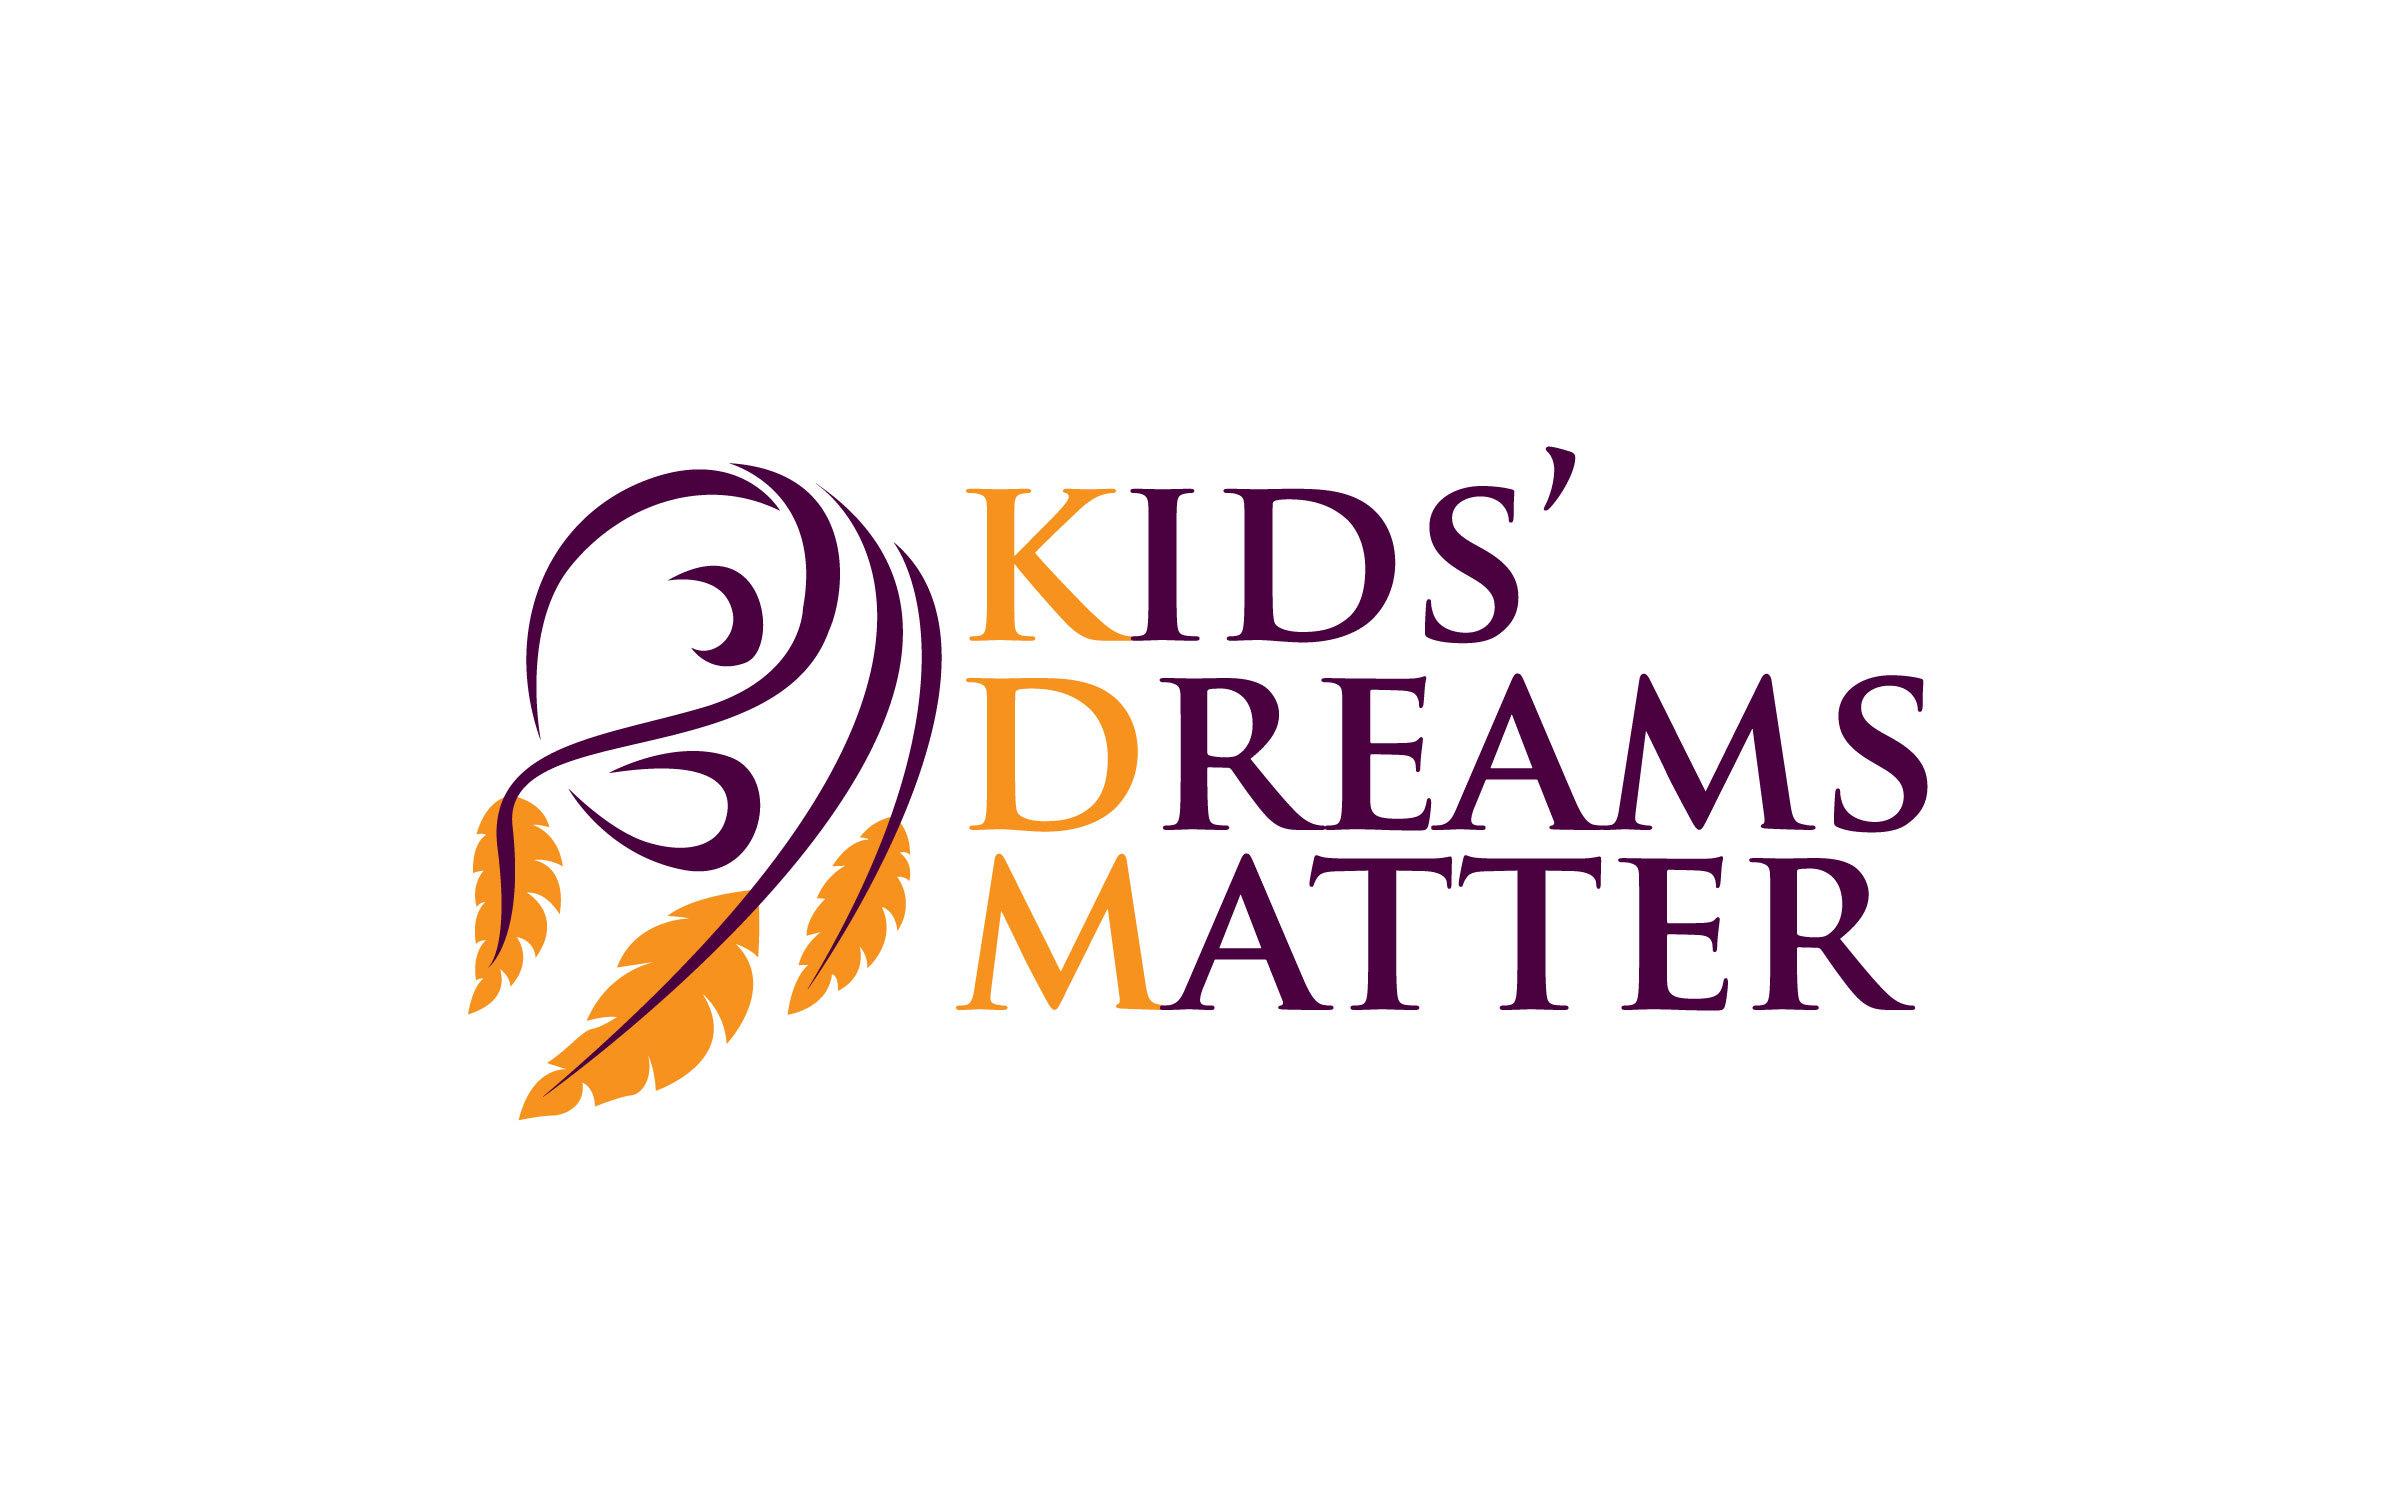 Kid's Dreams Matter